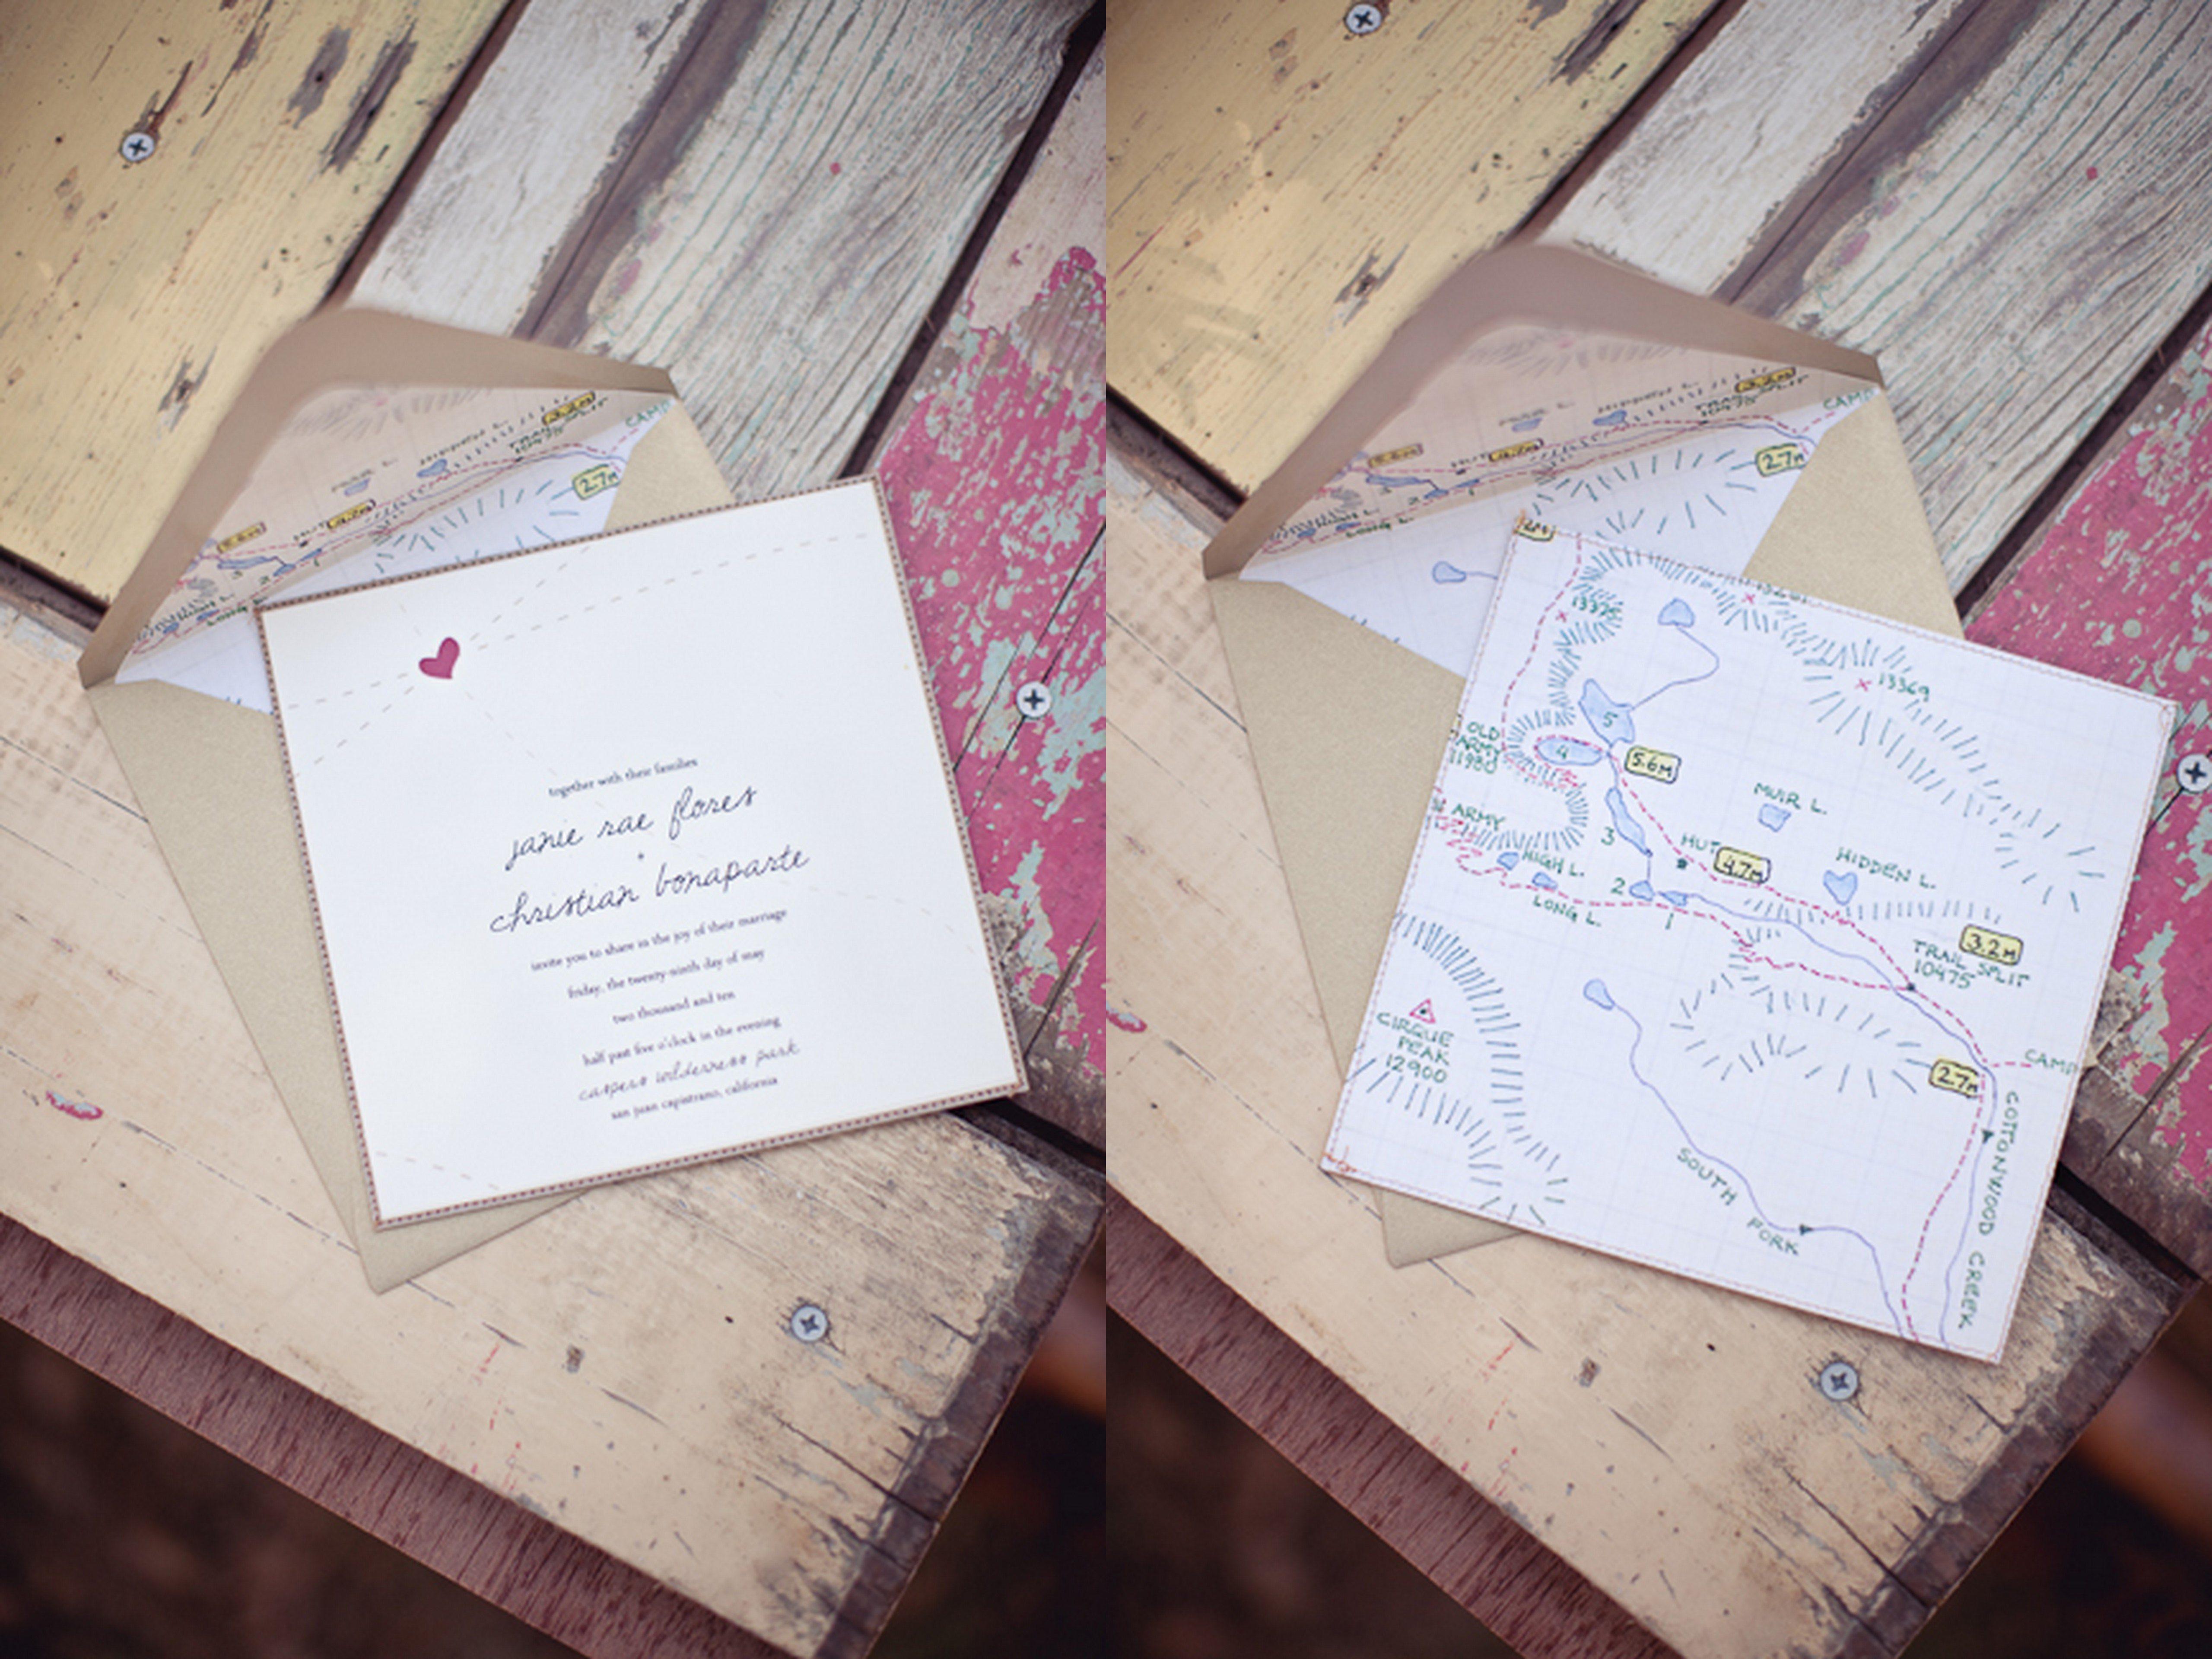 Up Themed Wedding Invitations: Diy-fabric-wedding-invitations-custom-trail-map-hiking